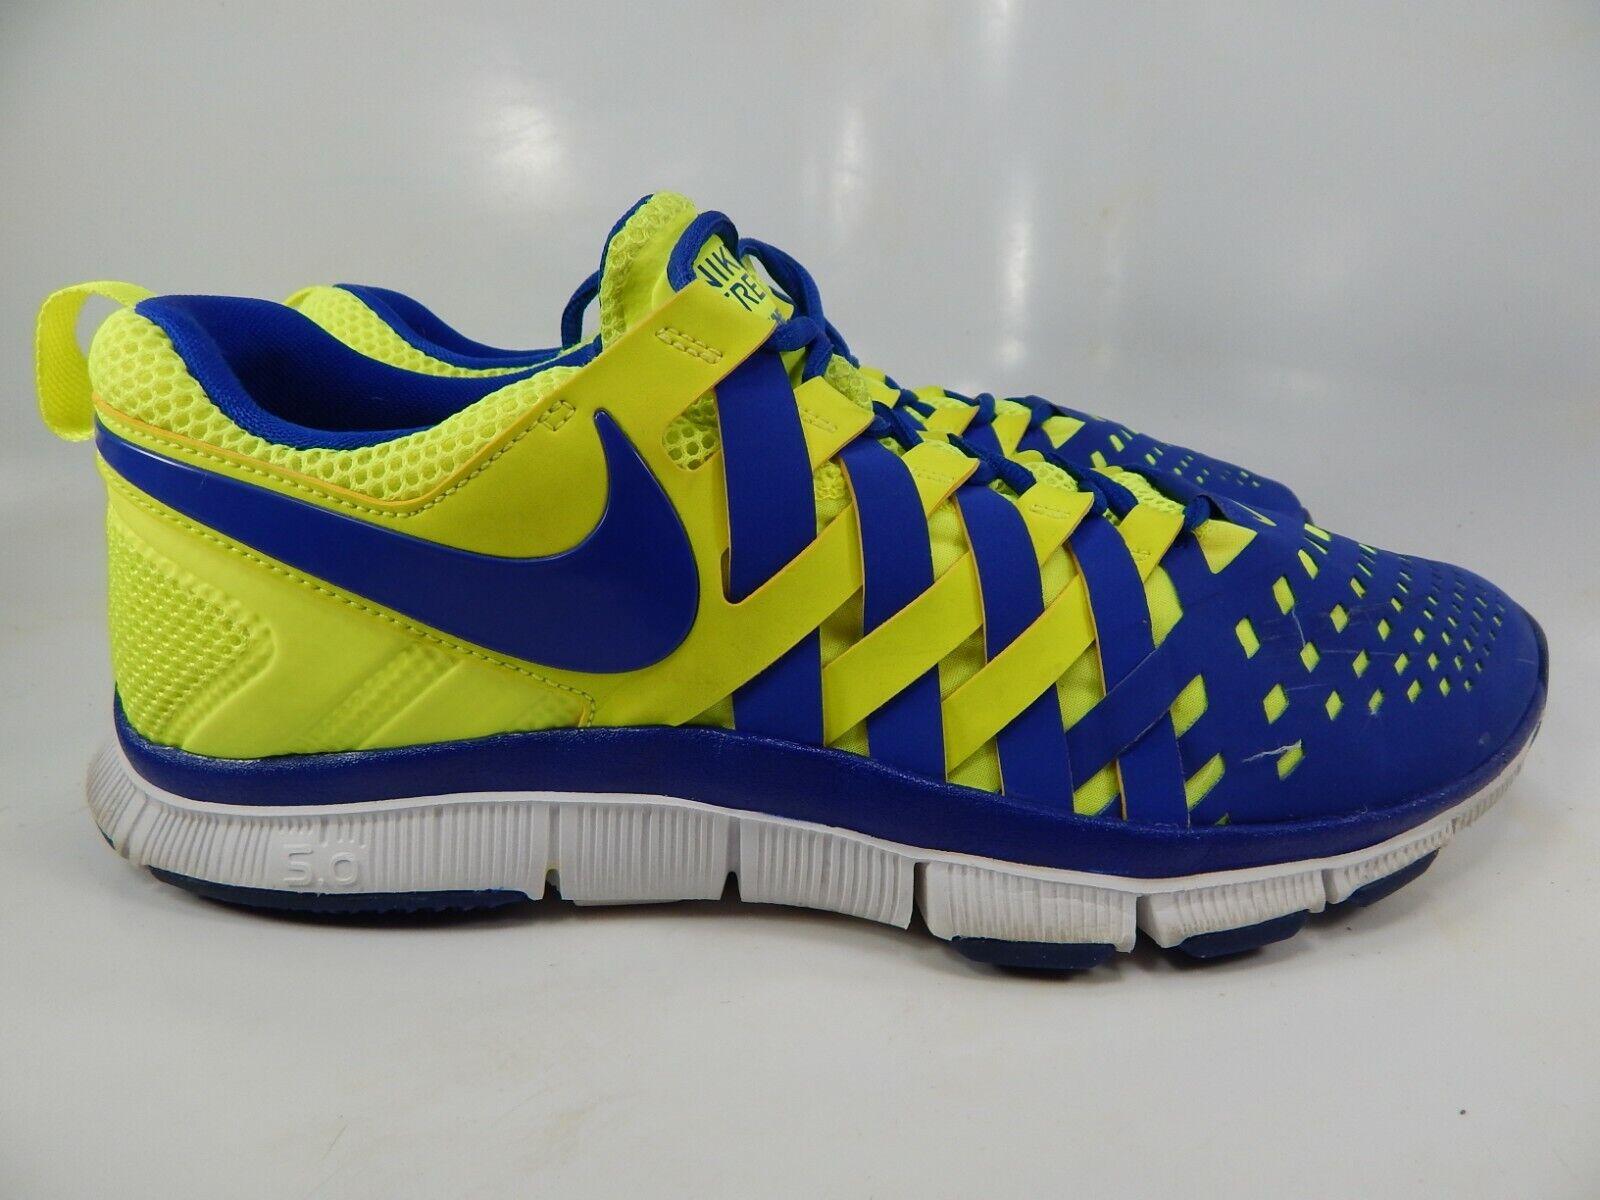 Nike 2013 Free Turnschuhe 5.0 Sz 11.5 M (D) Eu 45.5 Herren Turnschuhe 679809-700